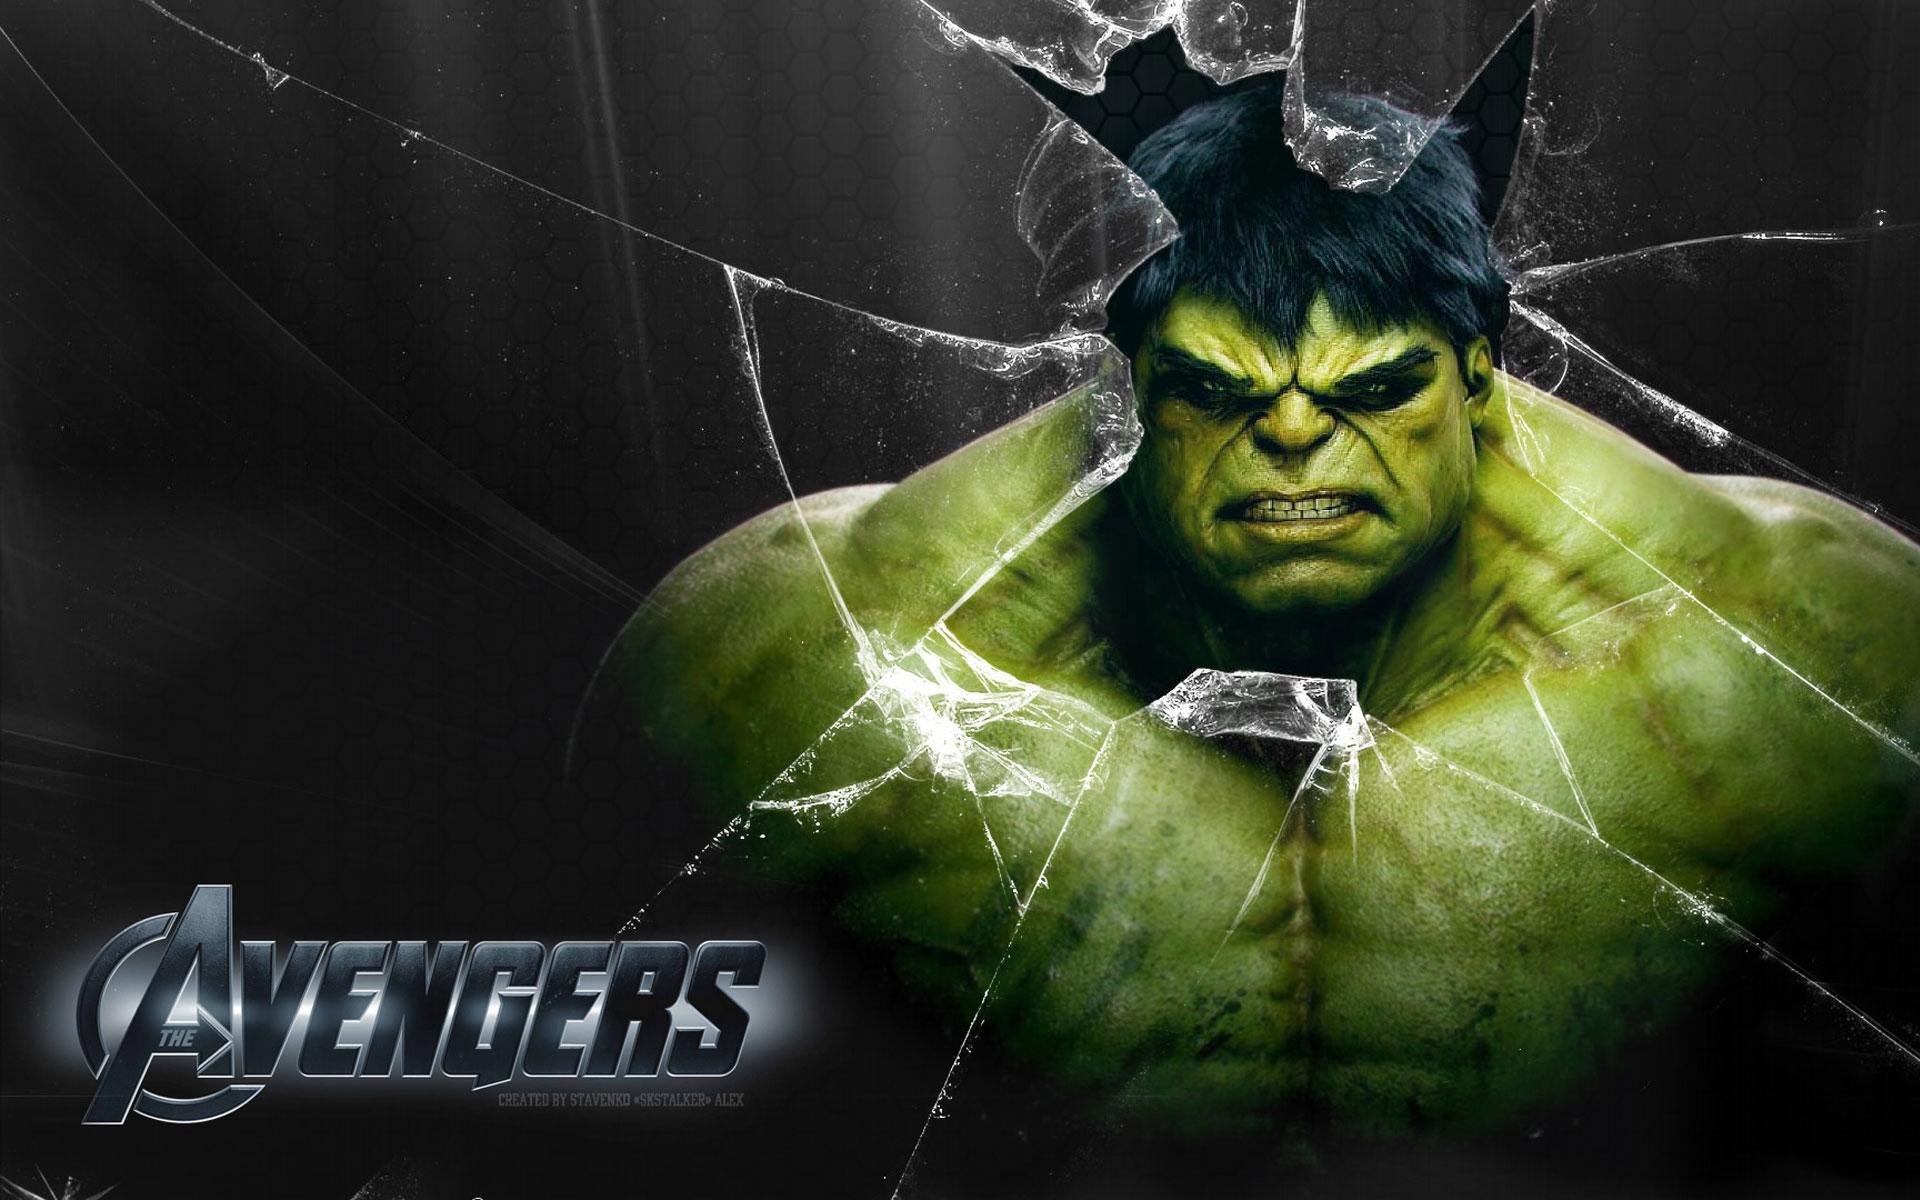 Avengers Hulk Exclusive HD Wallpapers 6283 1920x1200